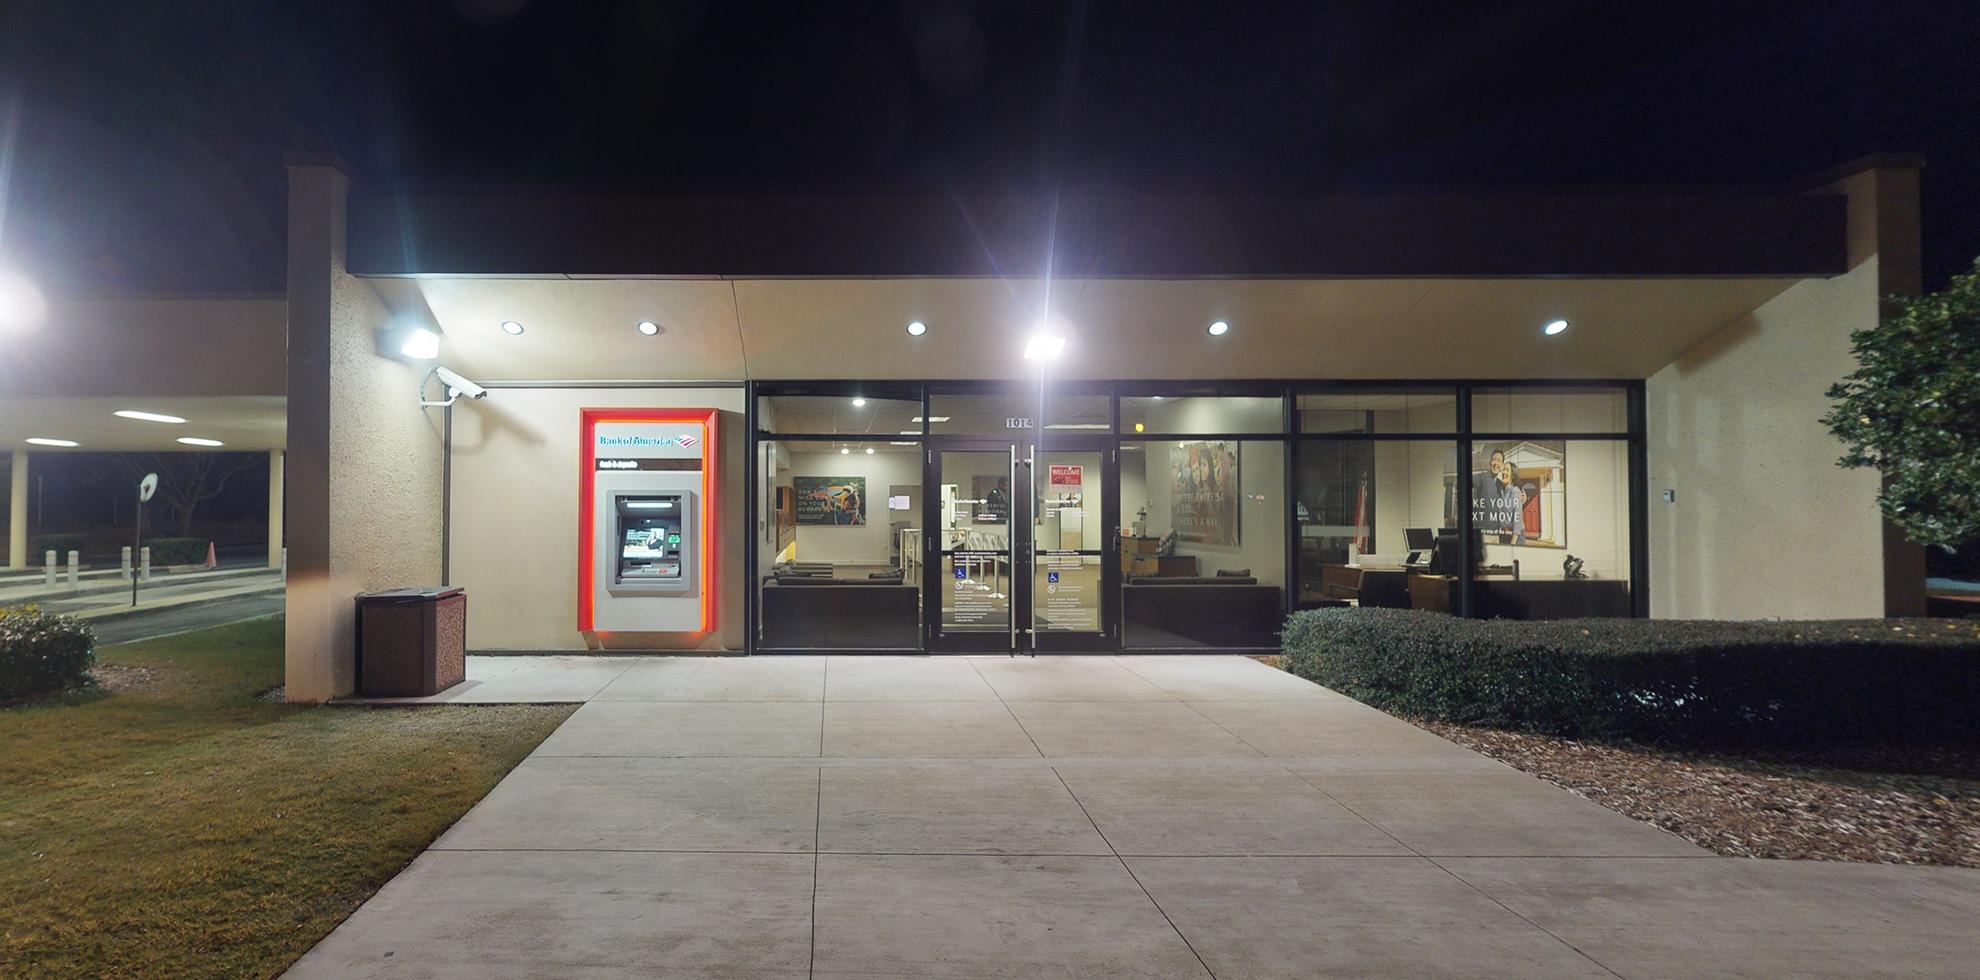 Bank of America financial center with drive-thru ATM | 1014 Highway 98 E, Destin, FL 32541